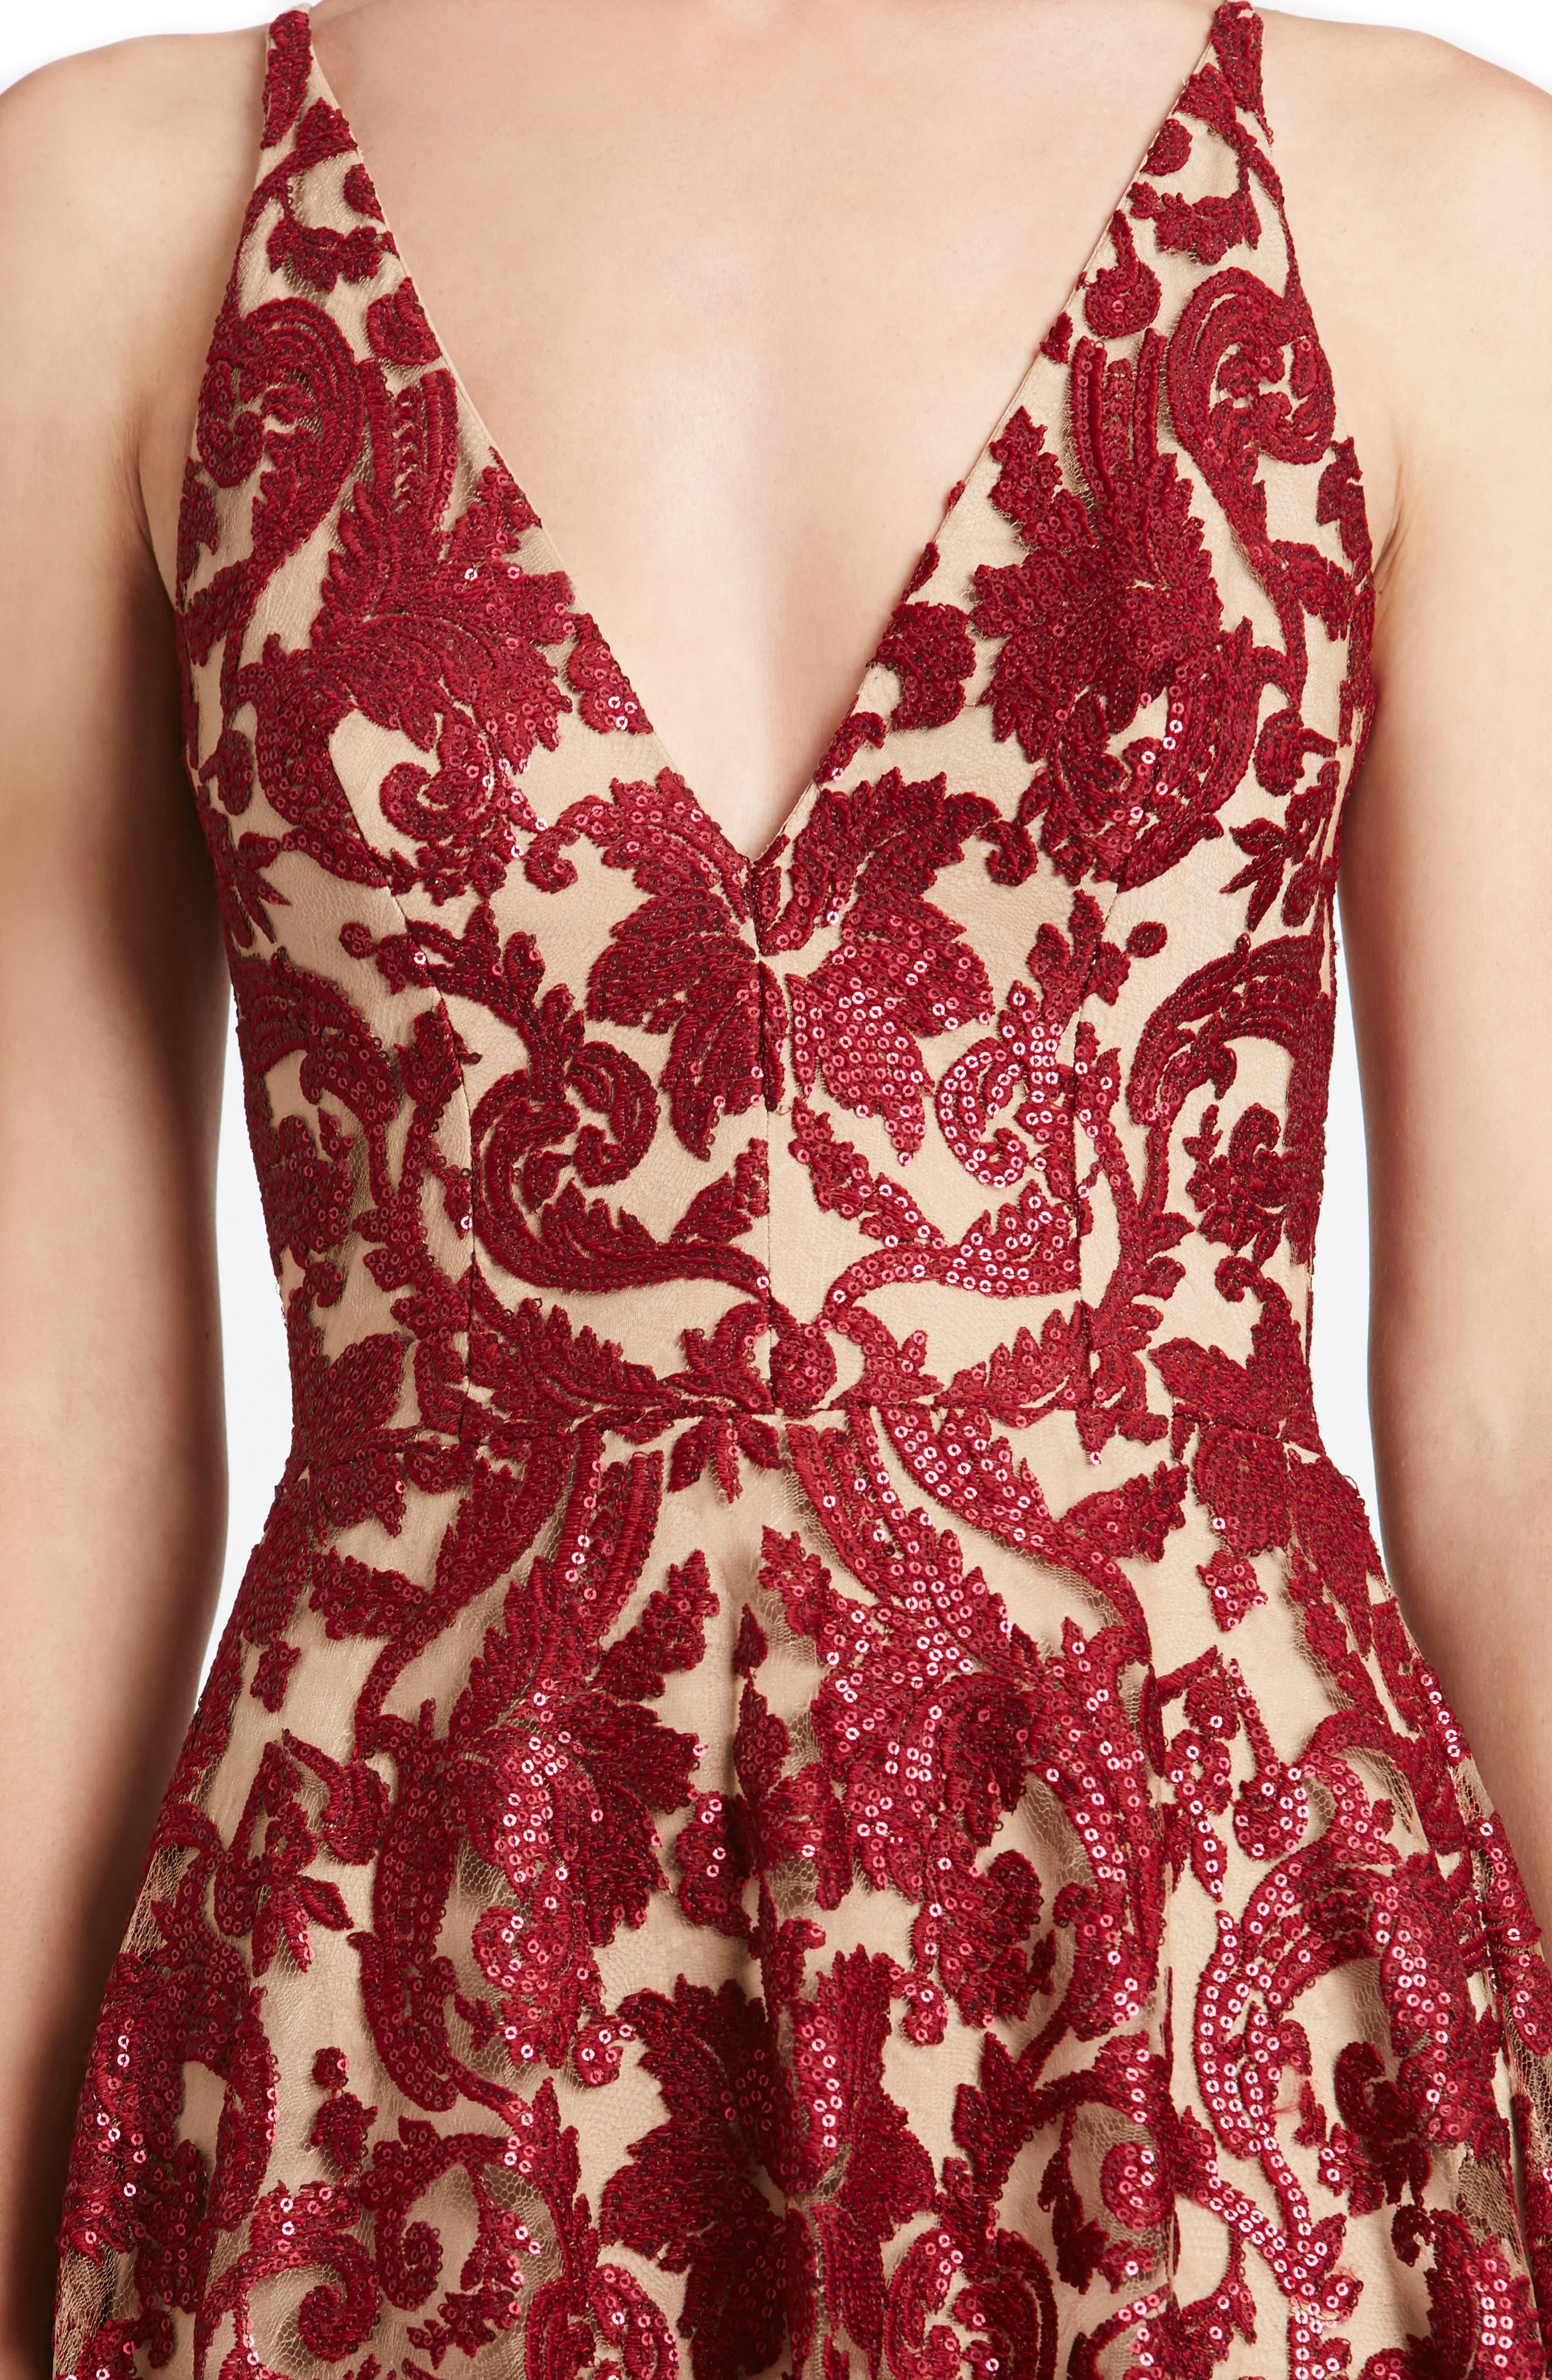 Blair Embellished Fit & Flare Dress,                             Alternate thumbnail 27, color,